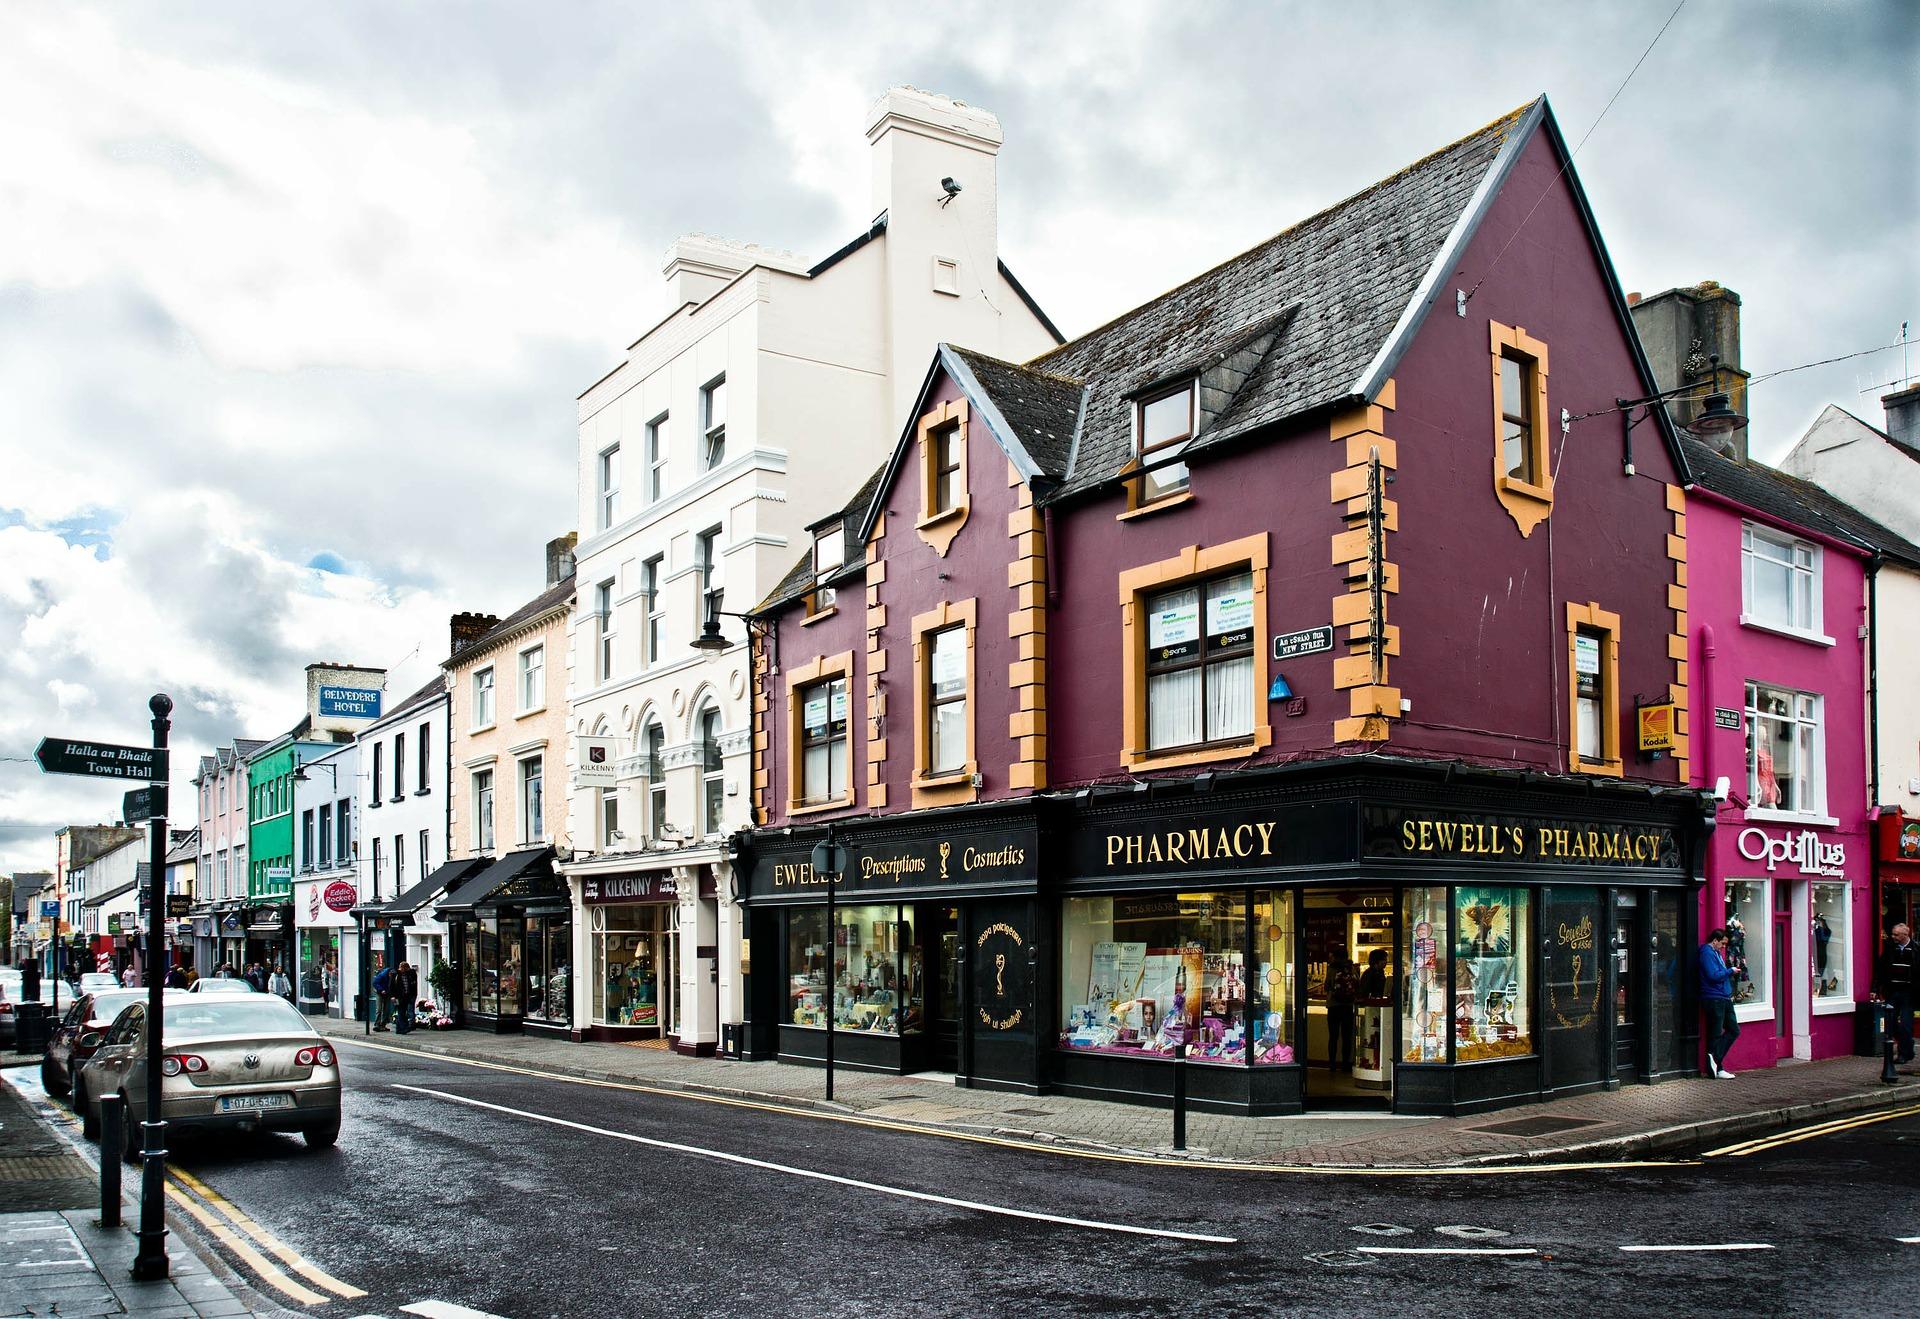 Private detectives and investigators in Ireland